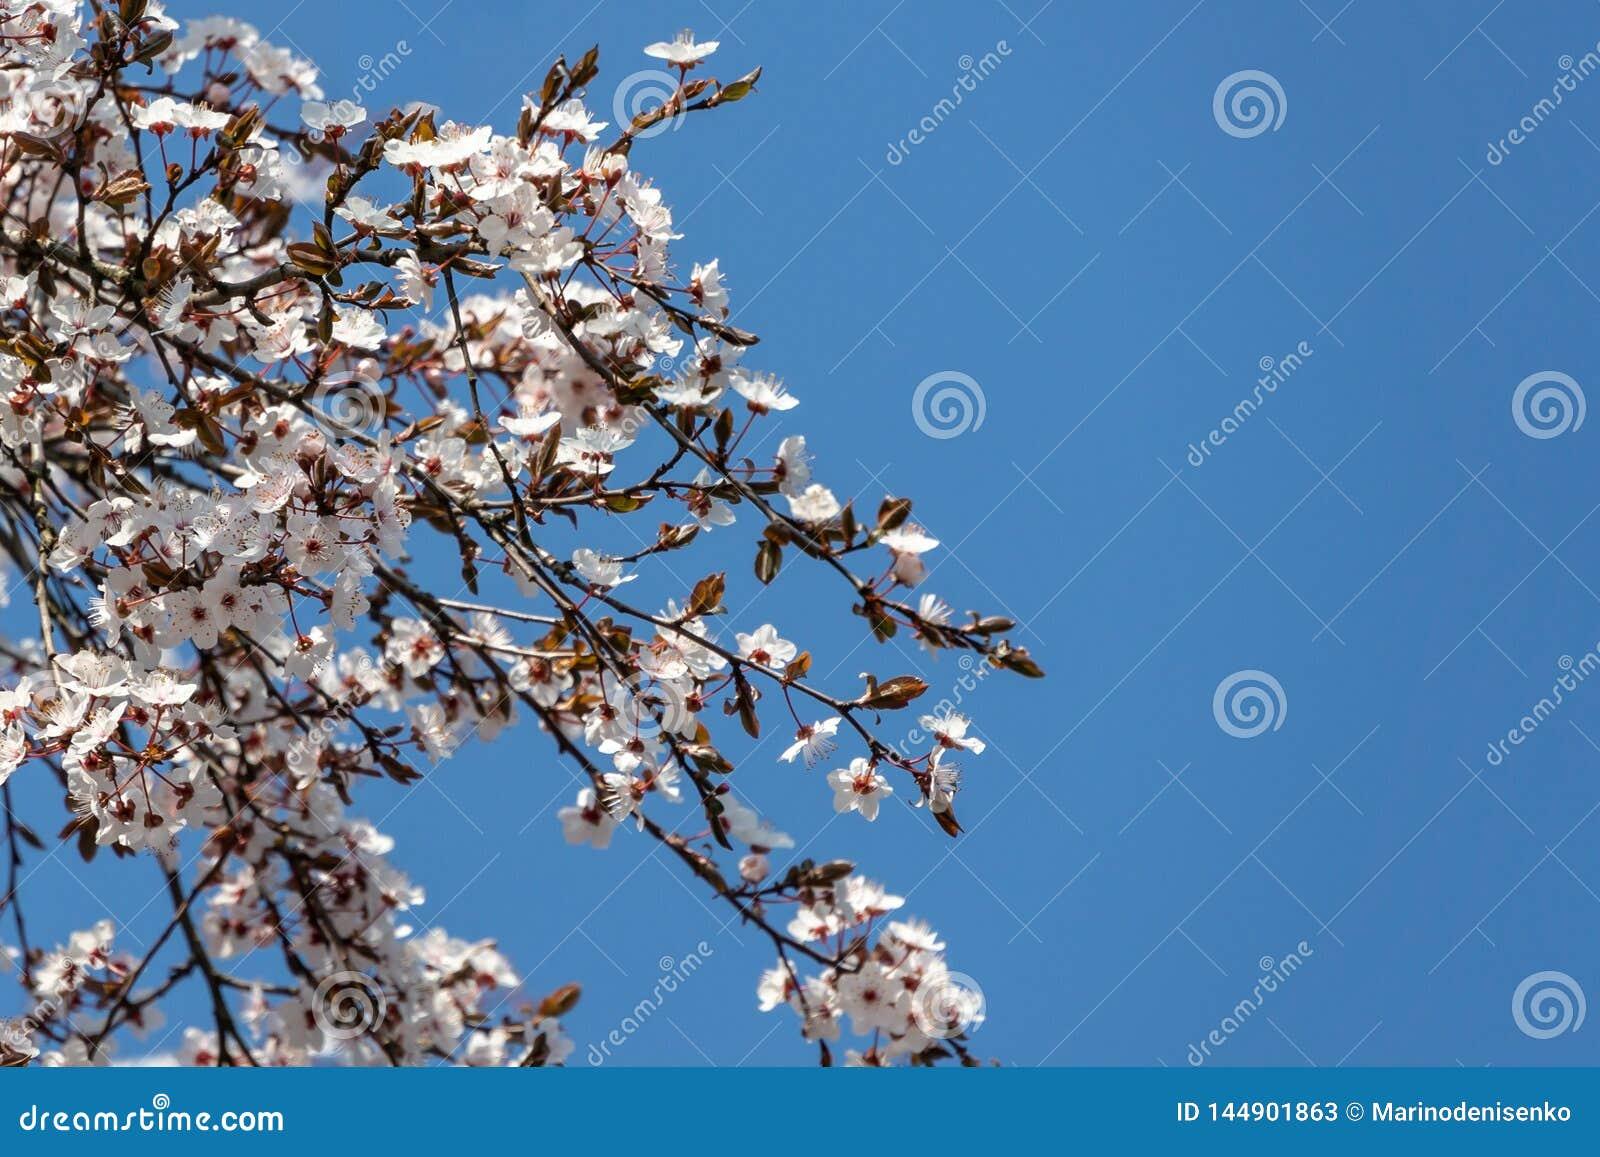 Vita blommor f?r den k?rsb?rsr?da plommonet blomstrar mot bakgrund av bl? himmel Mycket vita blommor i solig v?rdag Selektivt fok